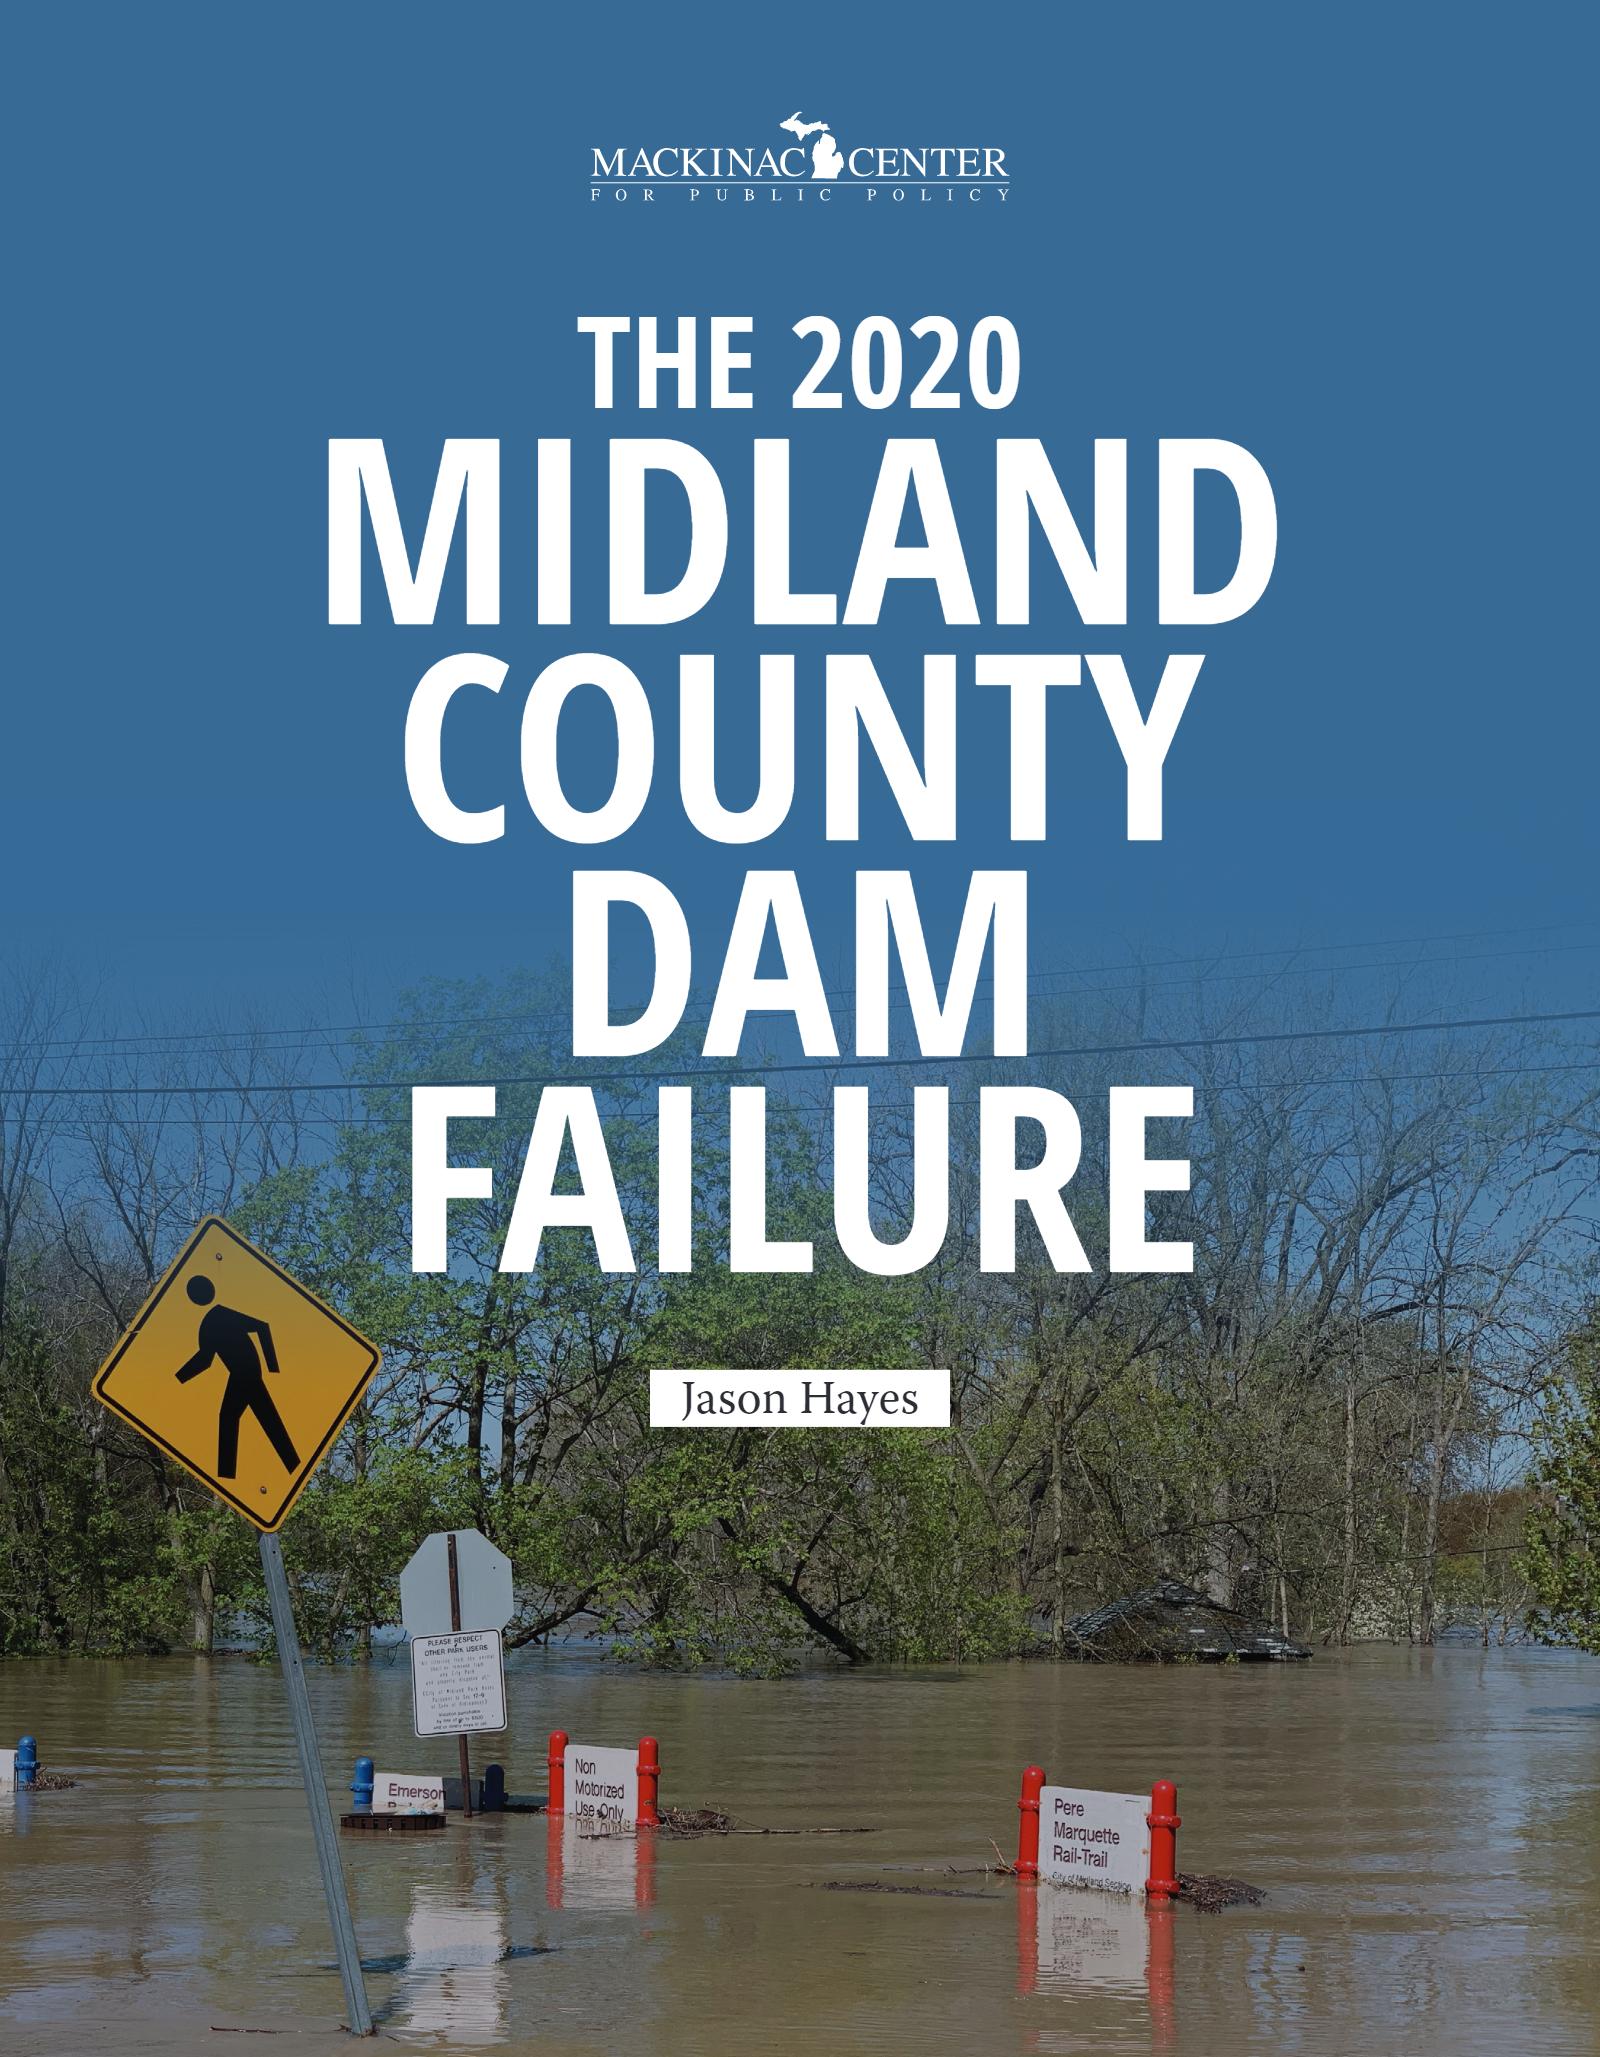 The 2020 Midland County Dam Failure